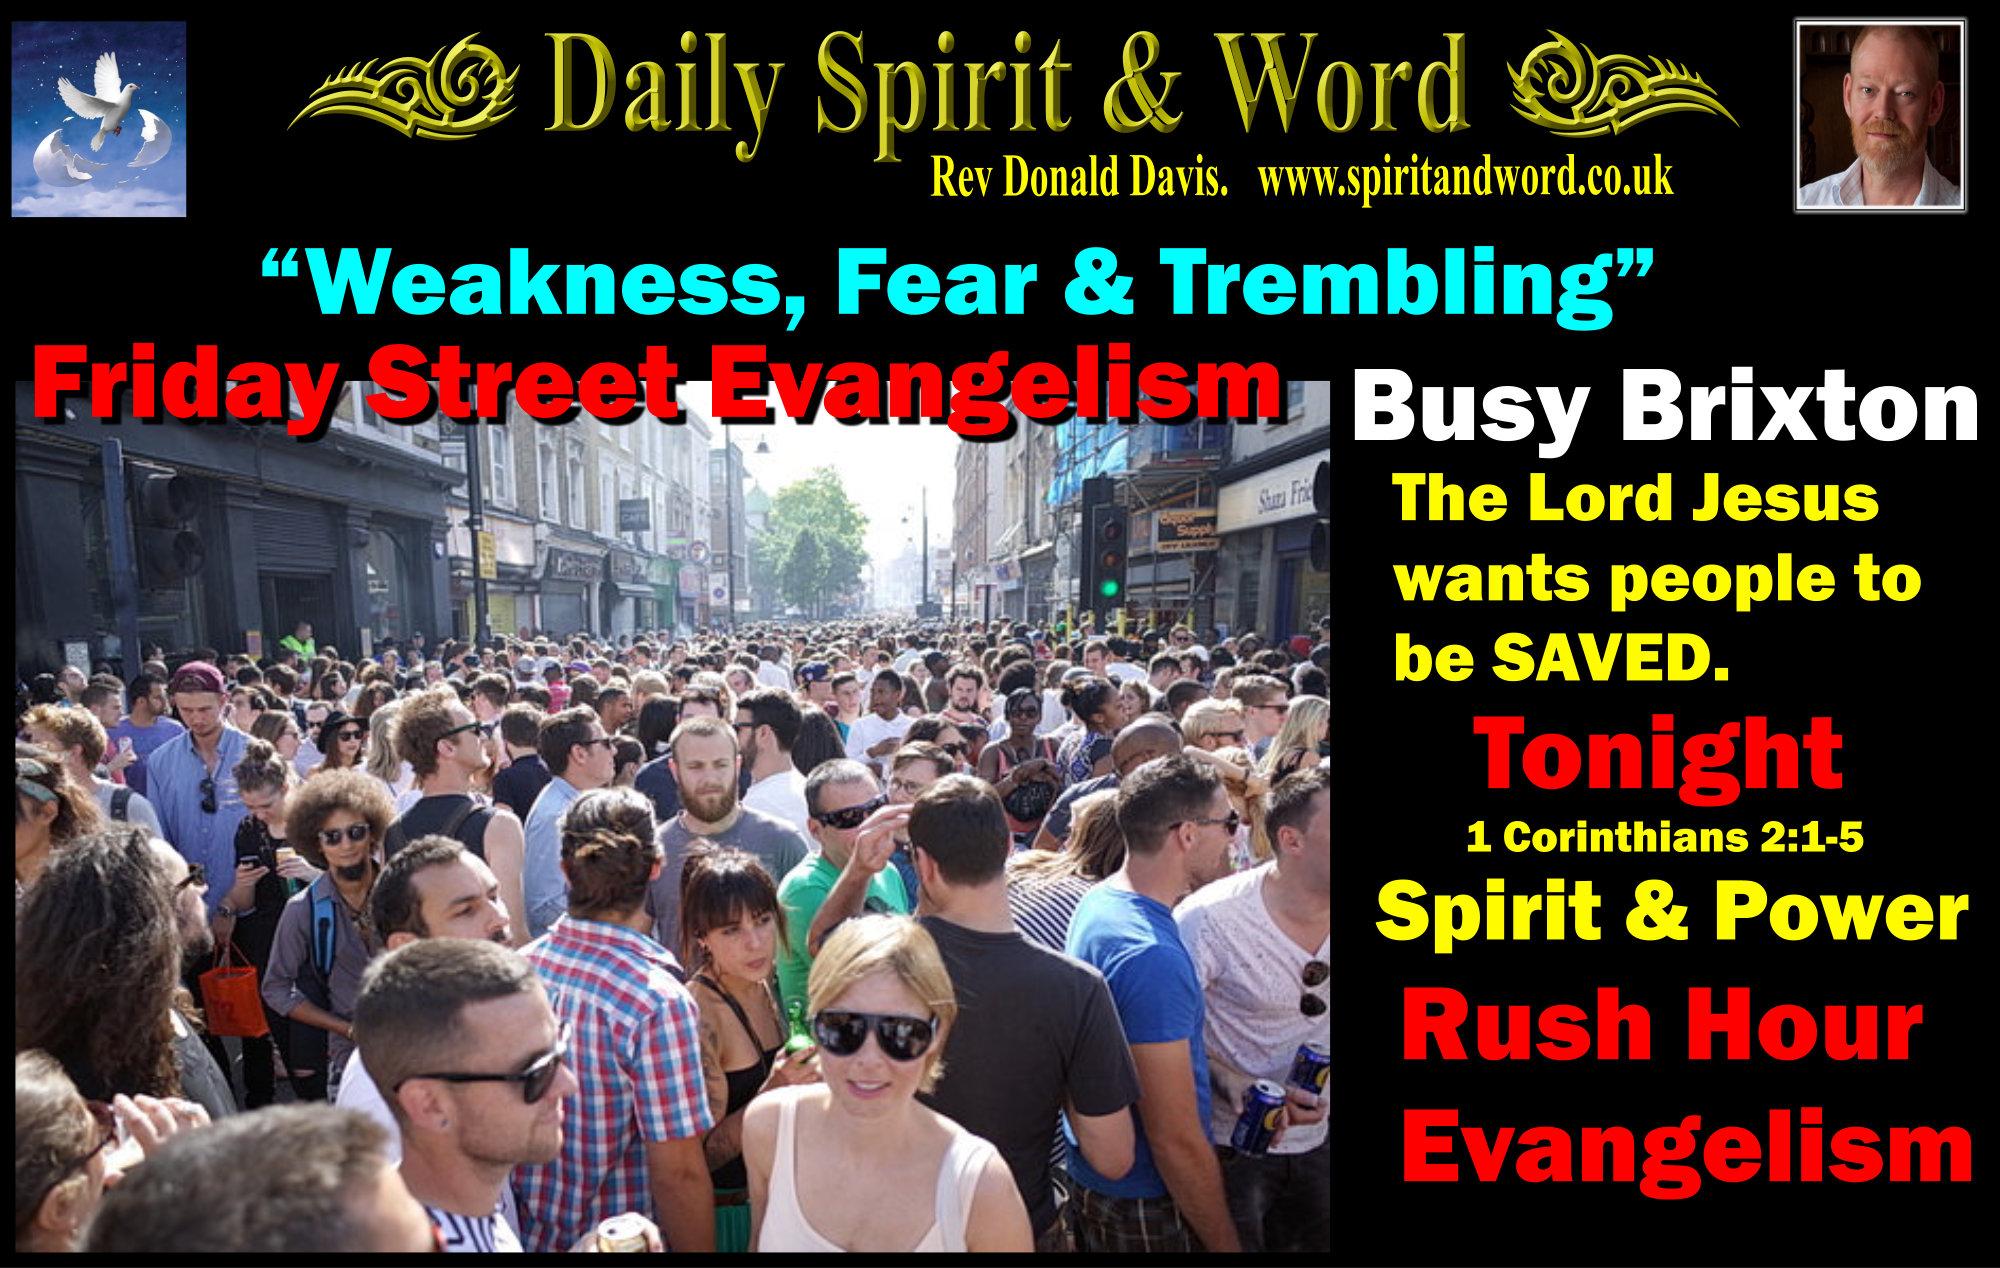 Rush Hour Evangelism